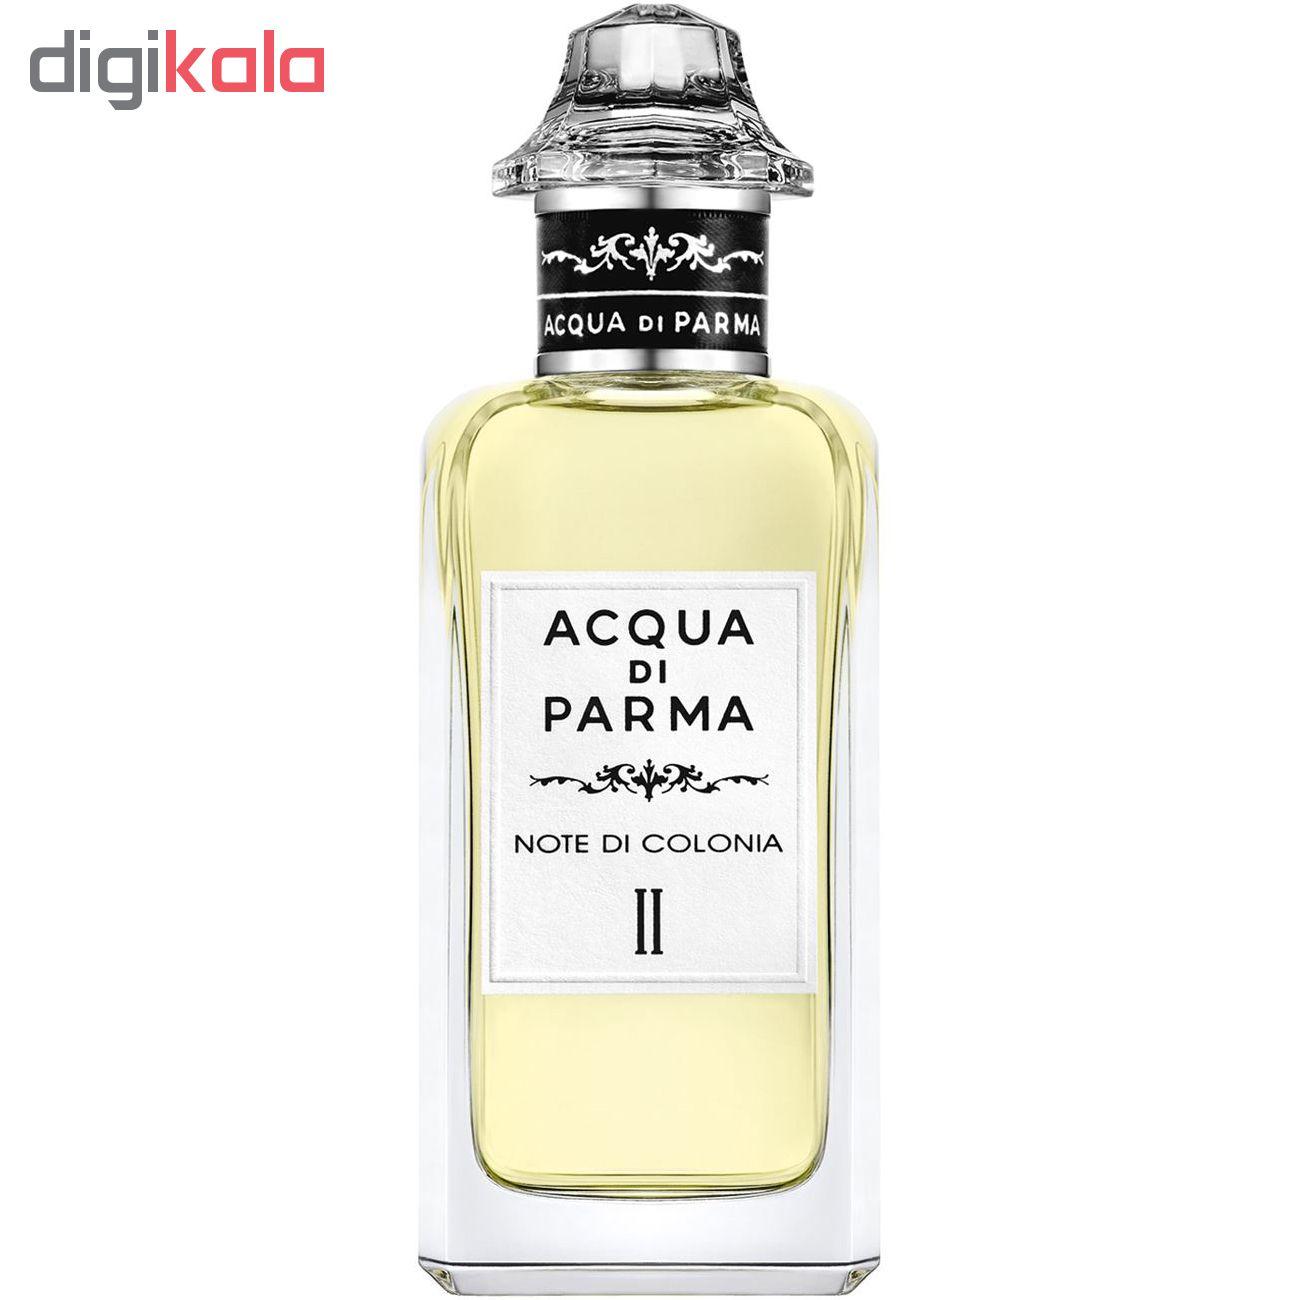 ادو کلن آکوا دی پارما مدل NOTE DI COLONIA II حجم 150 میلی لیتر